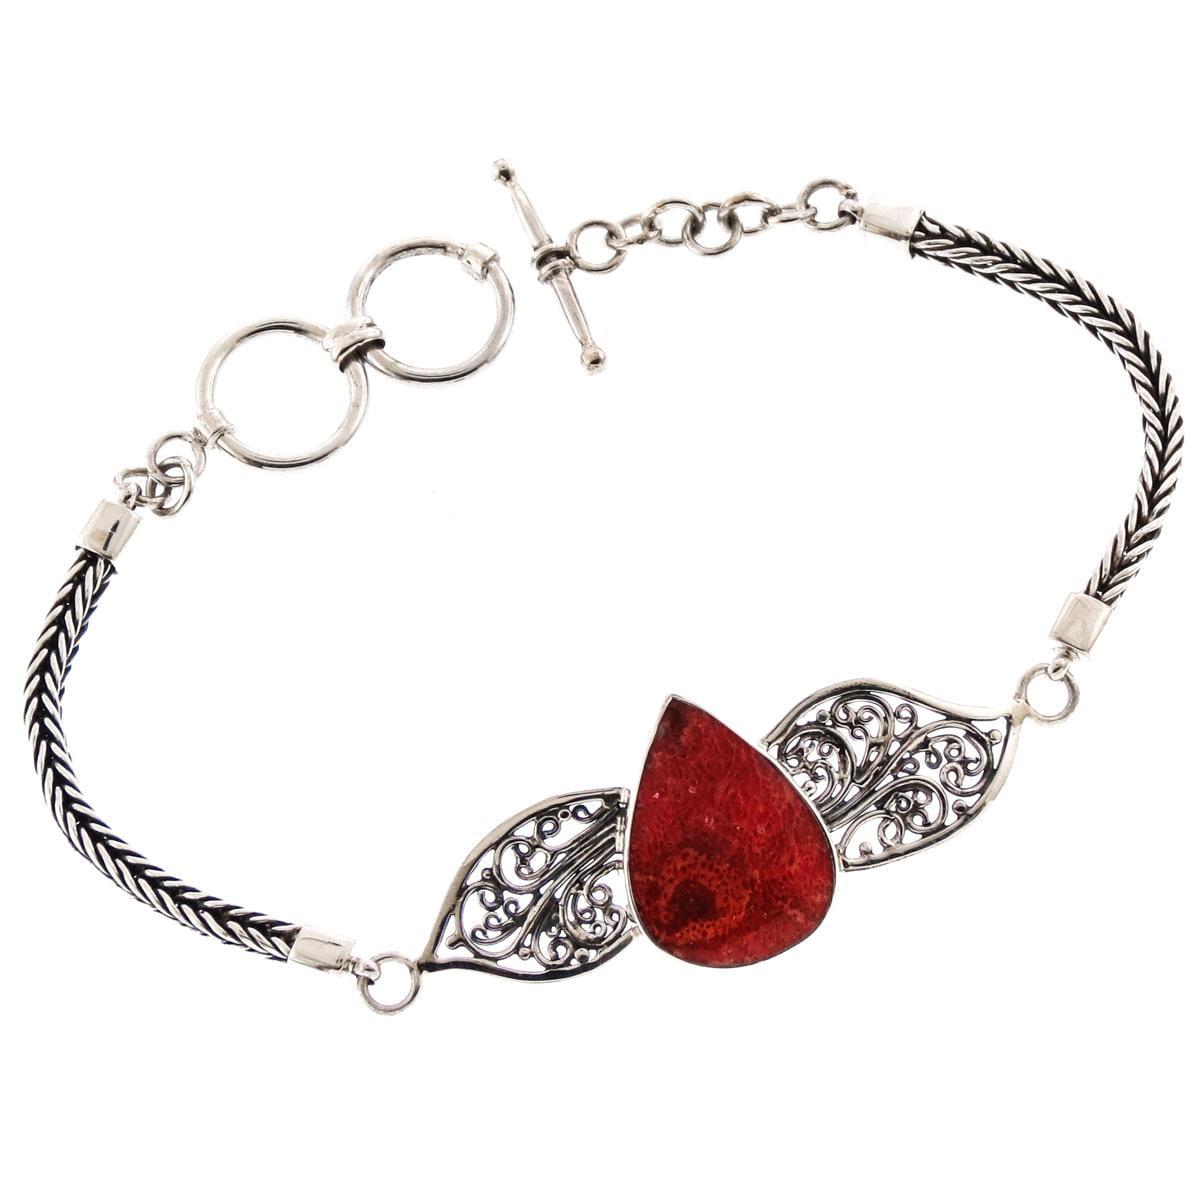 "Pear Red Sponge Coral 925 Sterling Silver Filigree Bracelet, 7 1 4-7 3 4"" by Firoma"